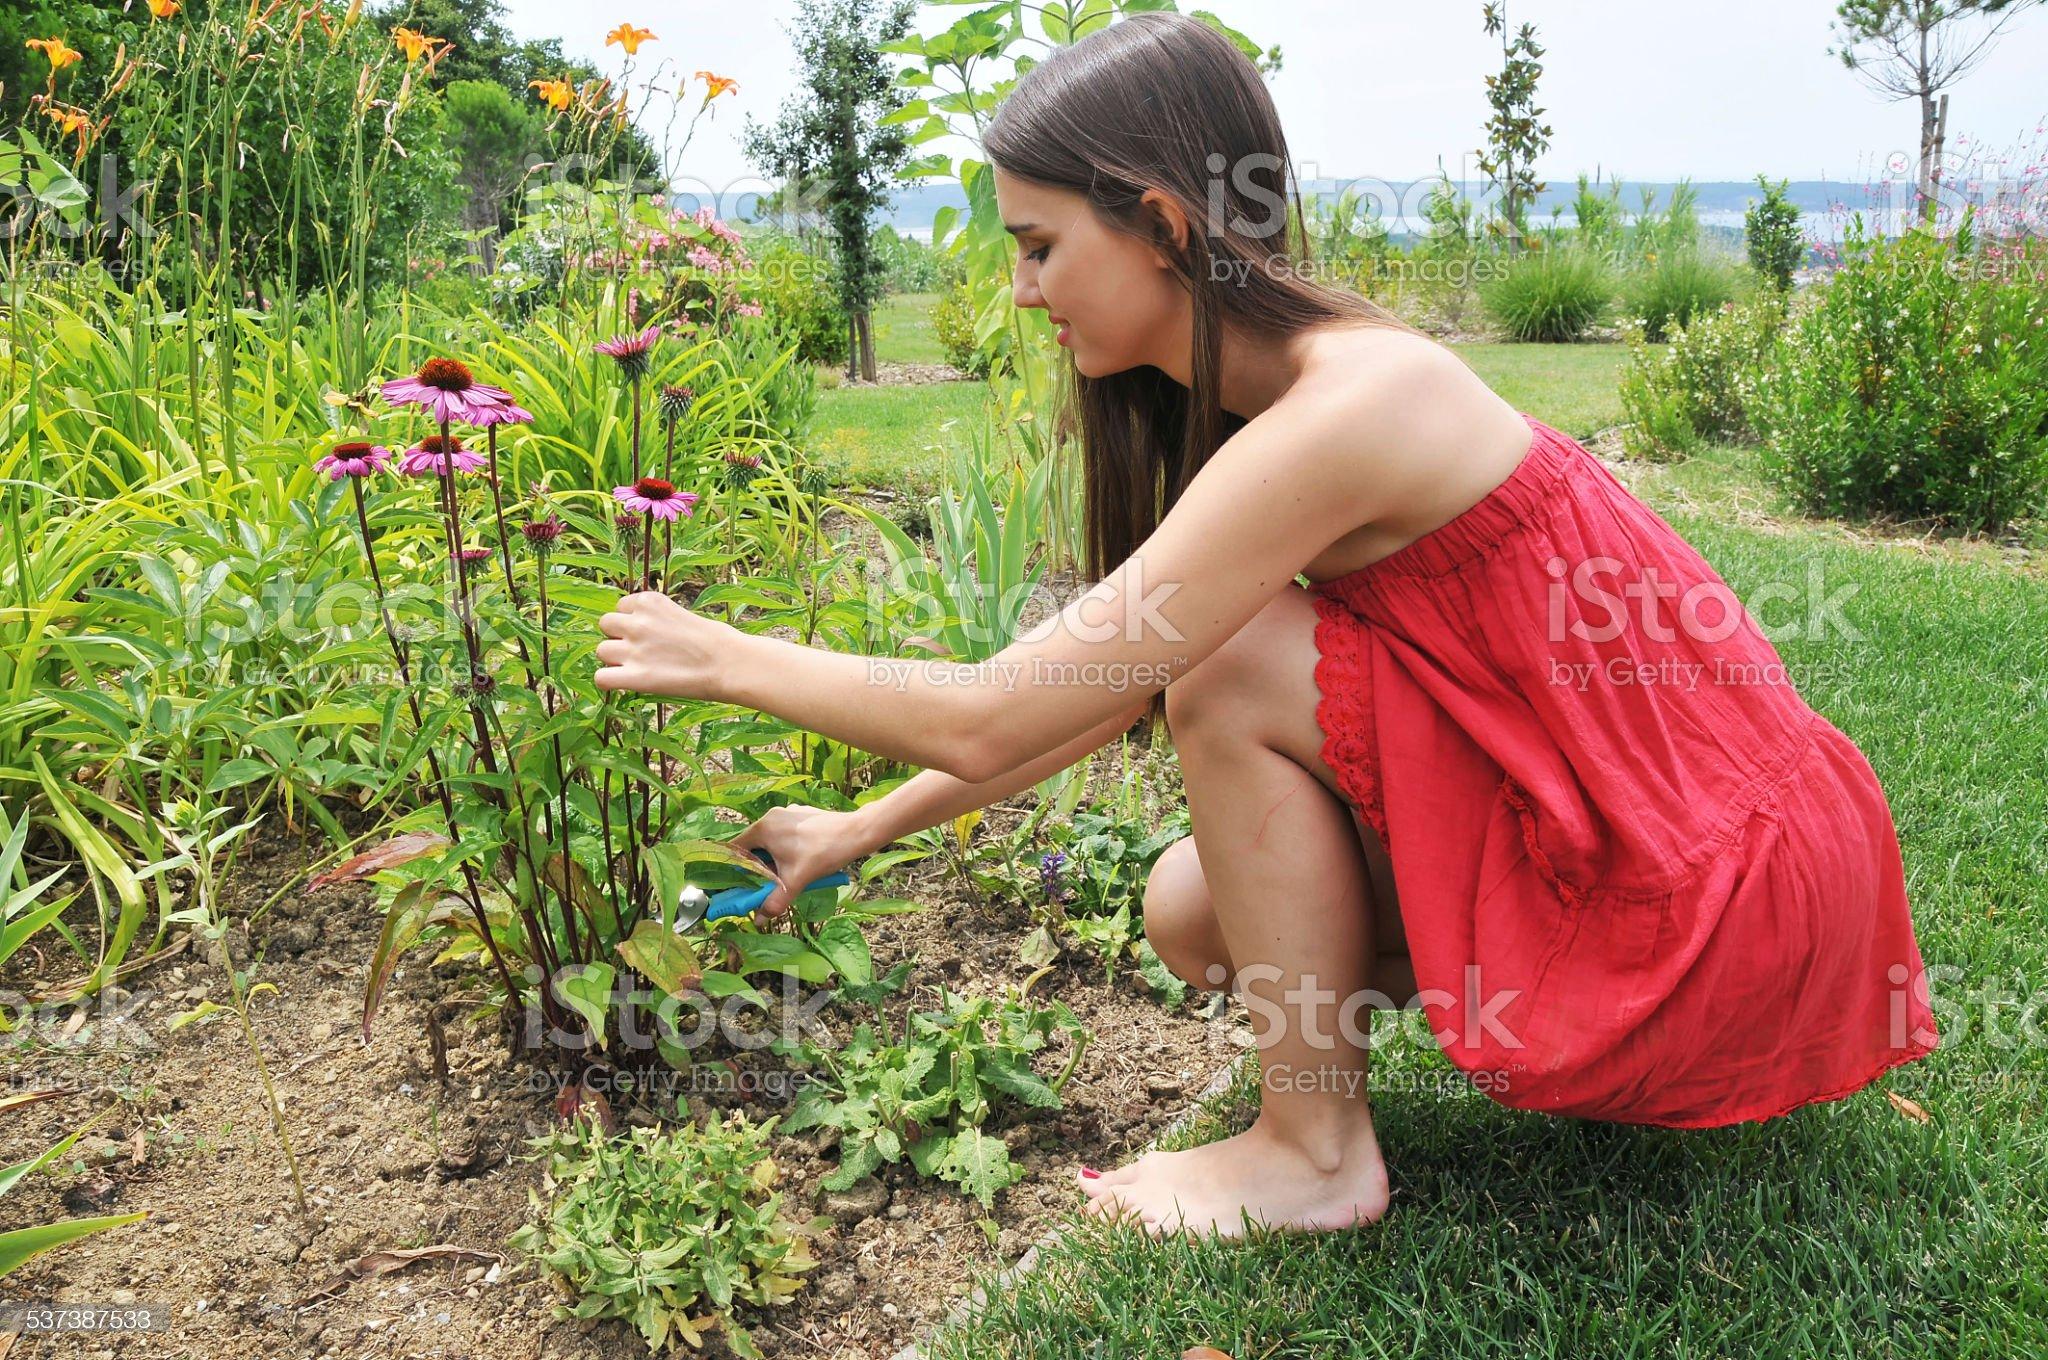 https://media.istockphoto.com/photos/gardening-picture-id537387533?s=2048x2048